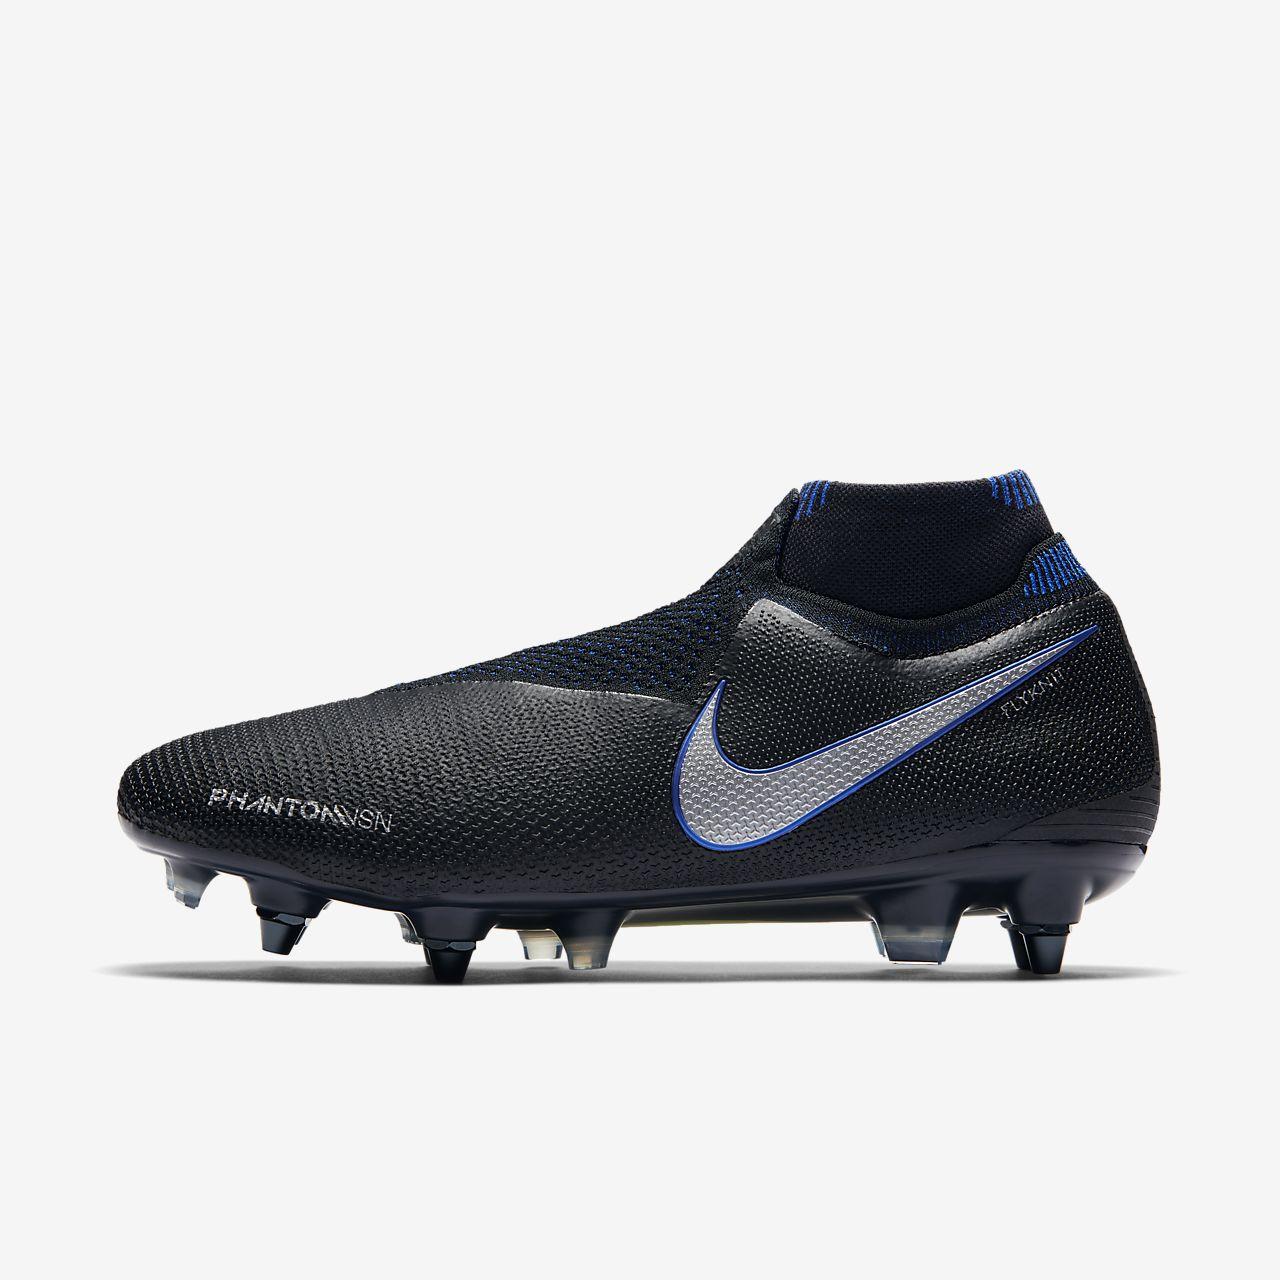 Calzado Clog Fit Dynamic Vision De Sg Elite Nike Phantom Fútbol Anti axBTawqzPr